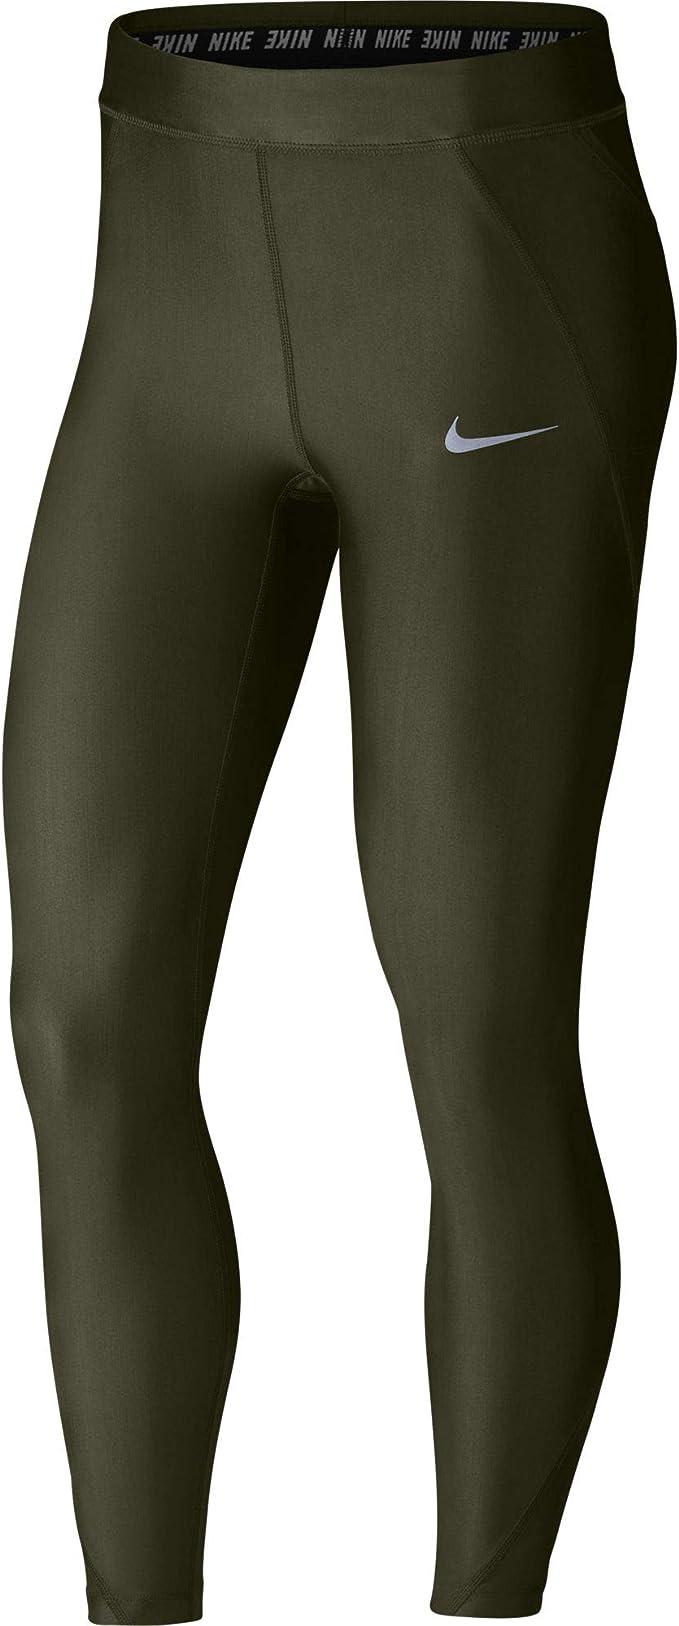 pantaloni corsa nike donna